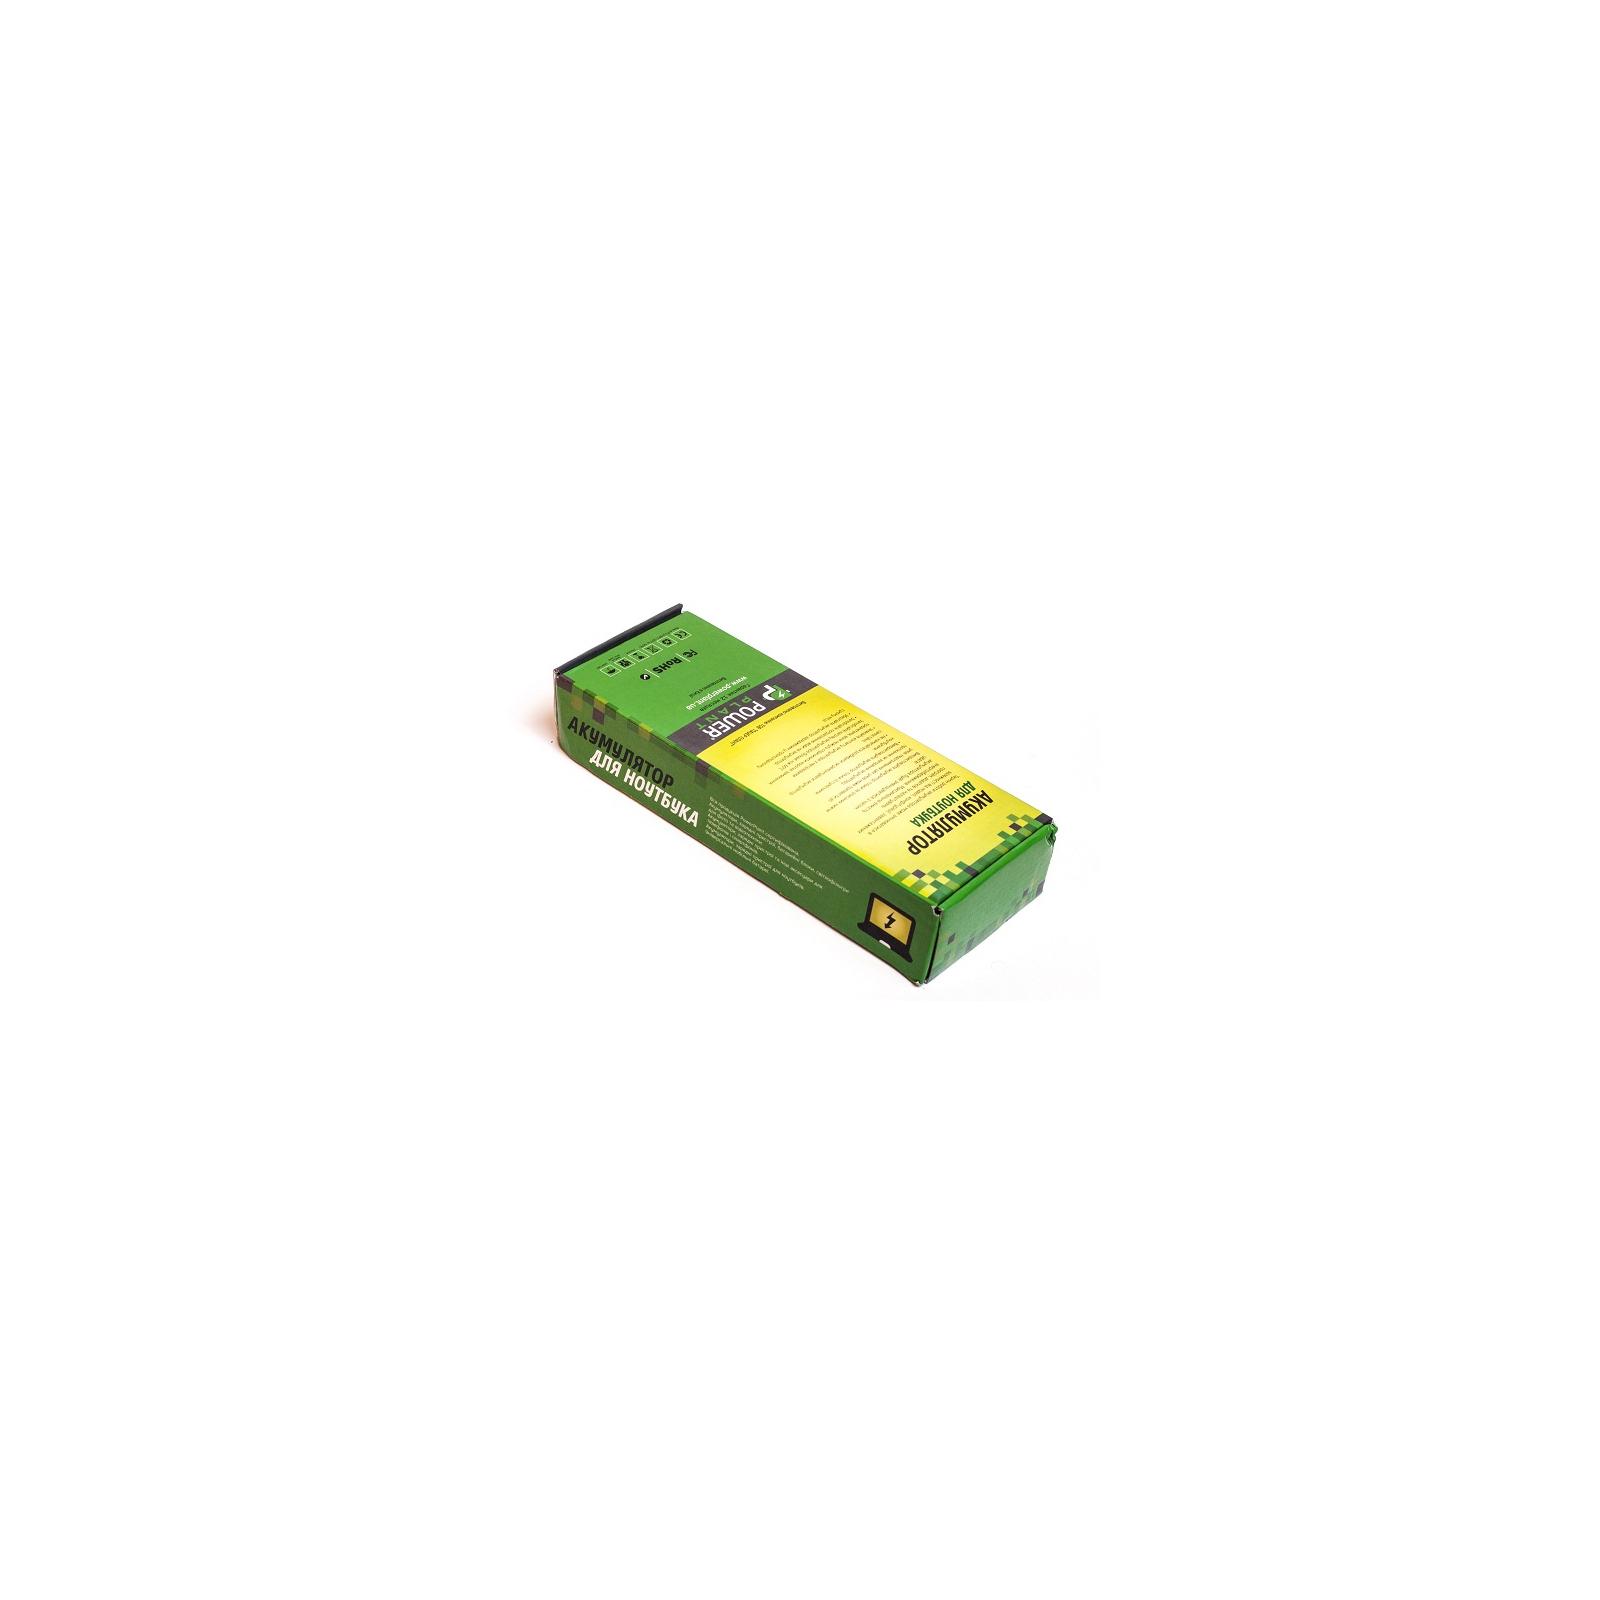 Аккумулятор для ноутбука HP 510-530 (HSTNN-IB45, H5530LH) 14.8V 5200mAh PowerPlant (NB00000125) изображение 2